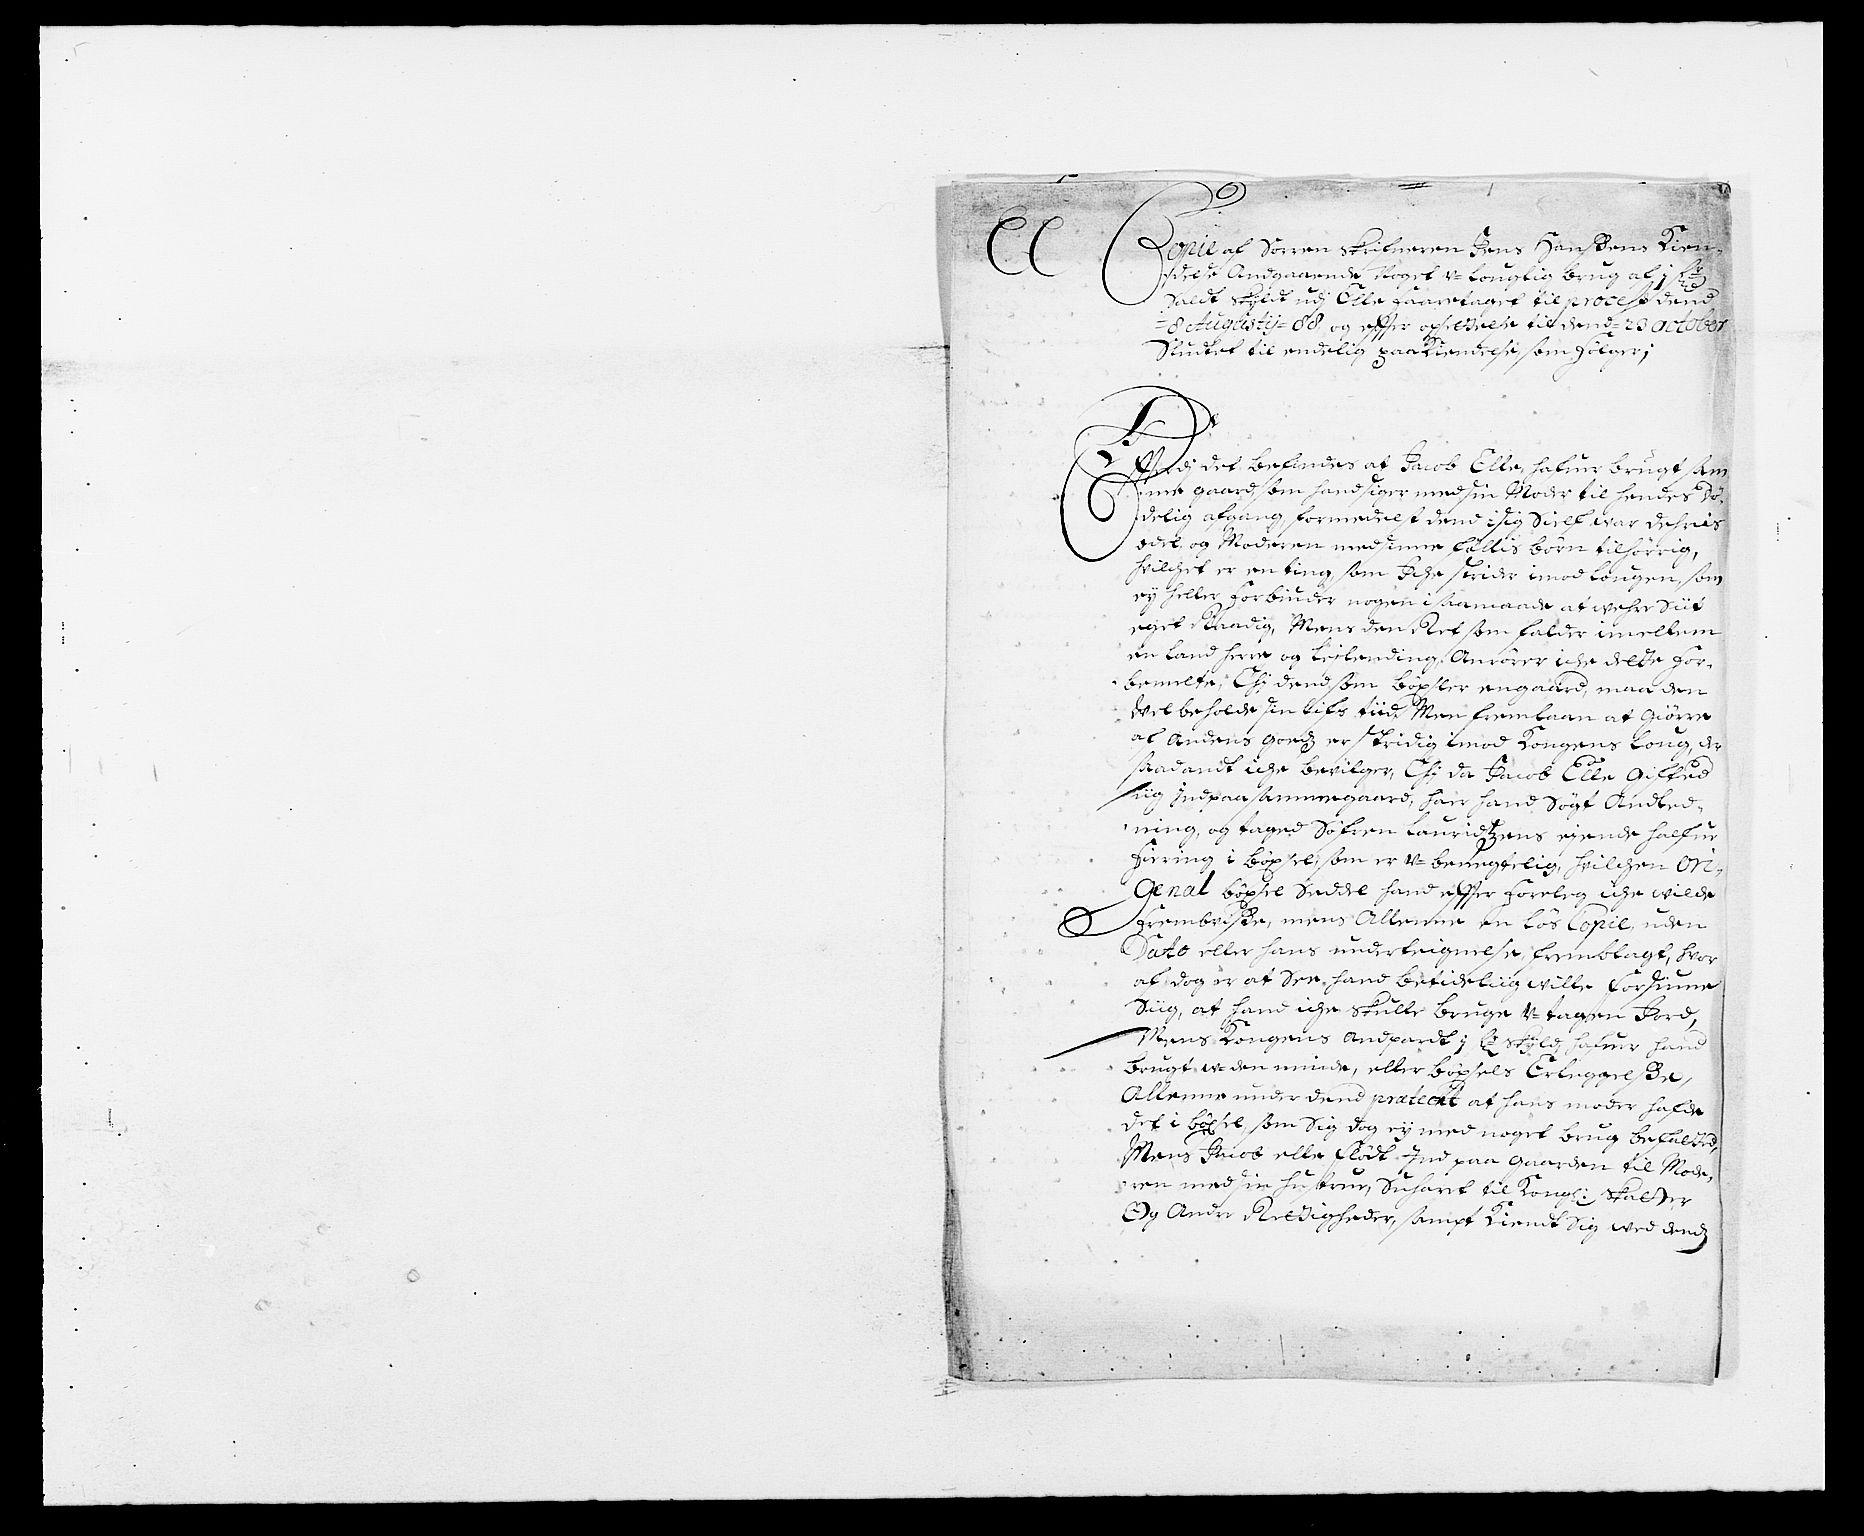 RA, Rentekammeret inntil 1814, Reviderte regnskaper, Fogderegnskap, R09/L0434: Fogderegnskap Follo, 1687-1688, s. 211